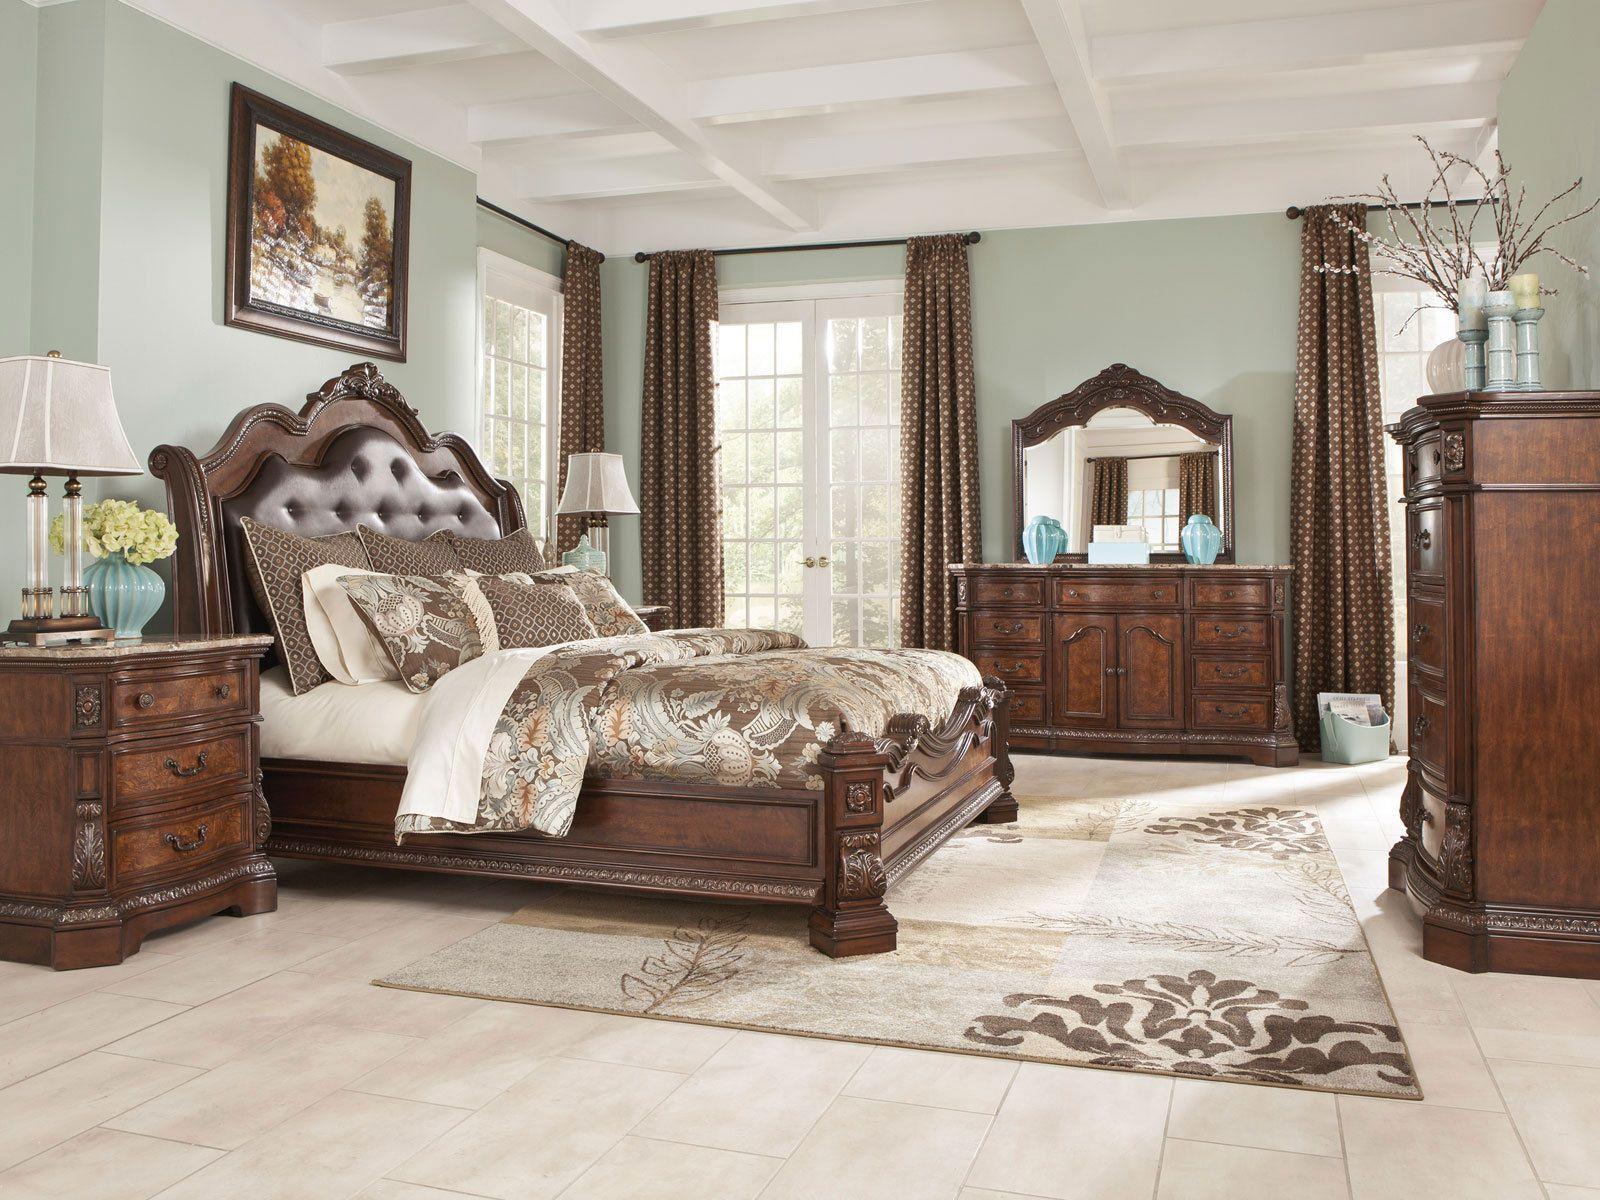 Ashley Furniture B705 Ledelle-Queen King Sleigh Bed Frame Bedroom ...